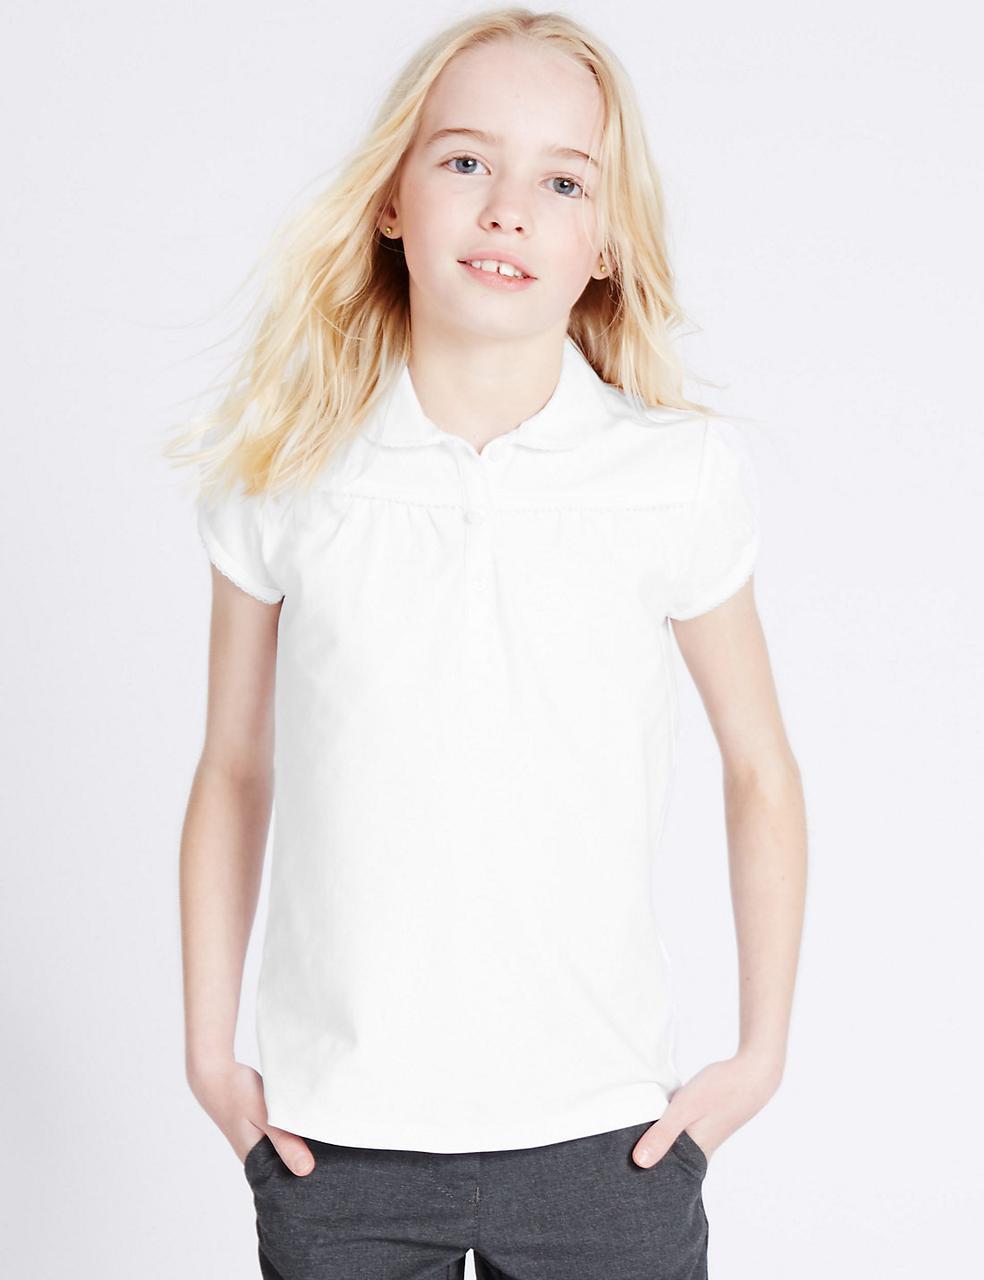 Школьная блузка белая трикотажная с коротким рукавом на девочку 6 лет Marks&Spencer (Англия)